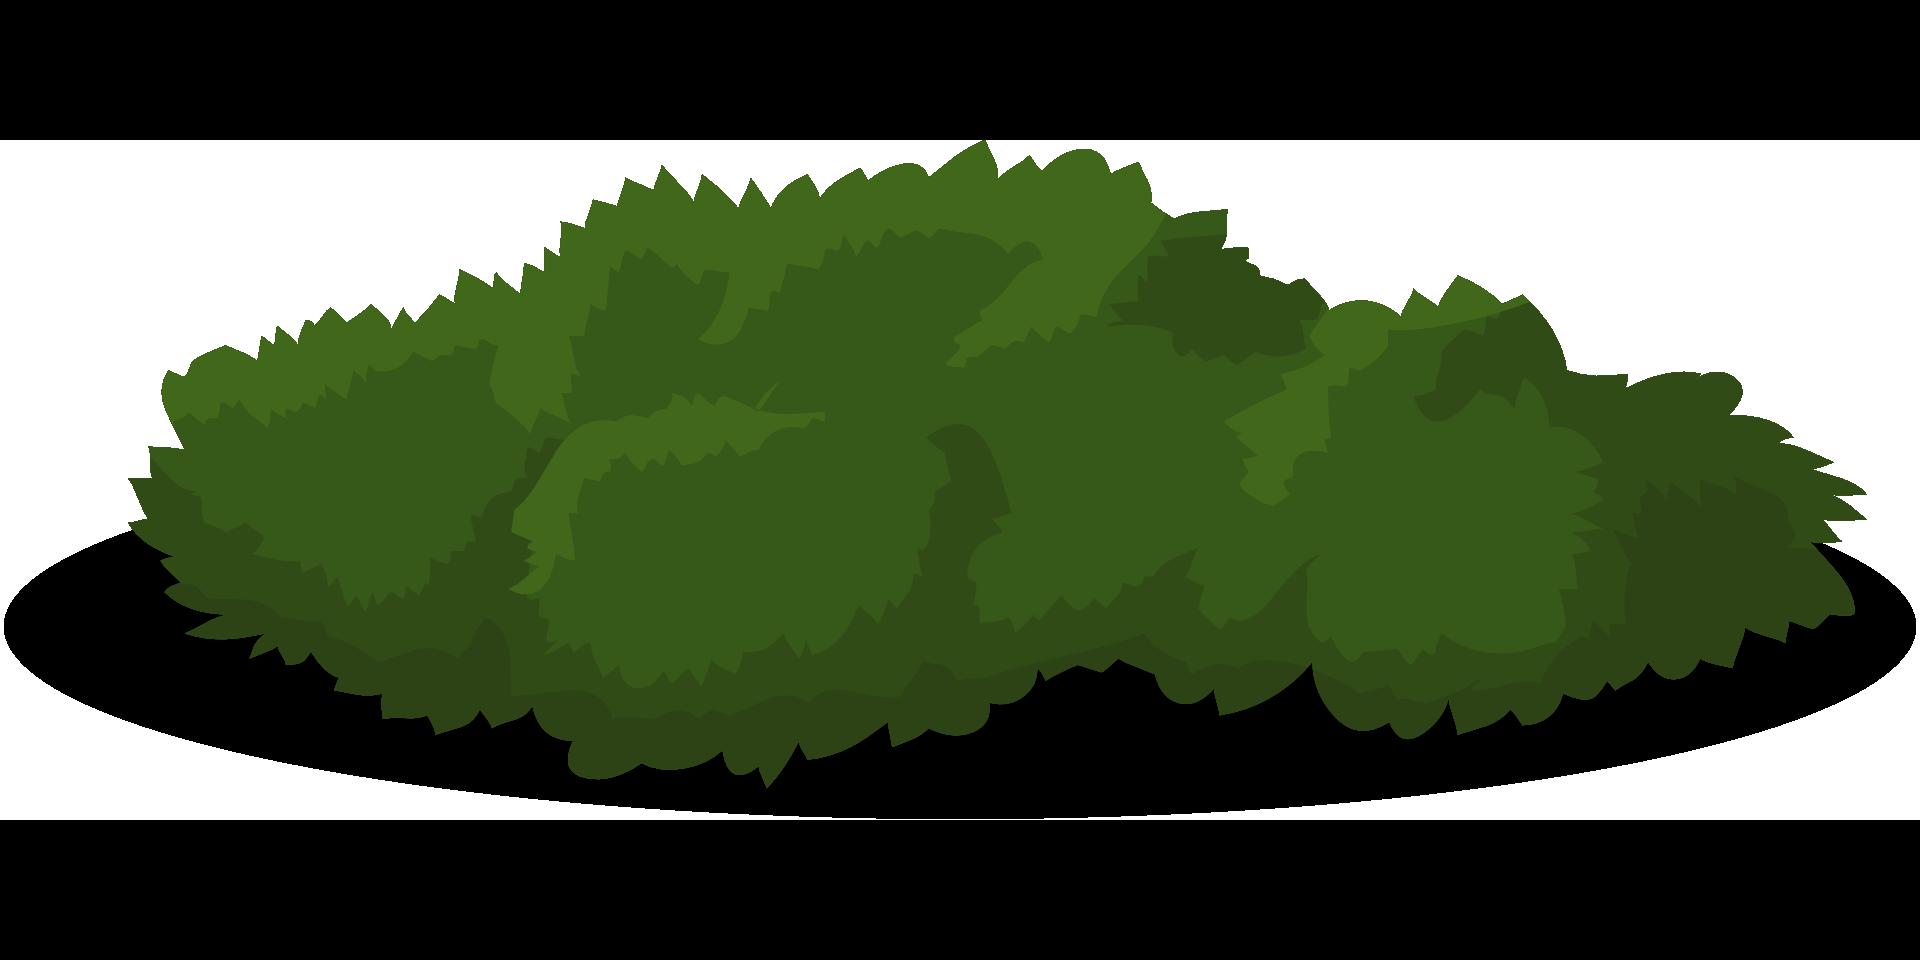 Grass clipart shrub. Drawing at getdrawings com